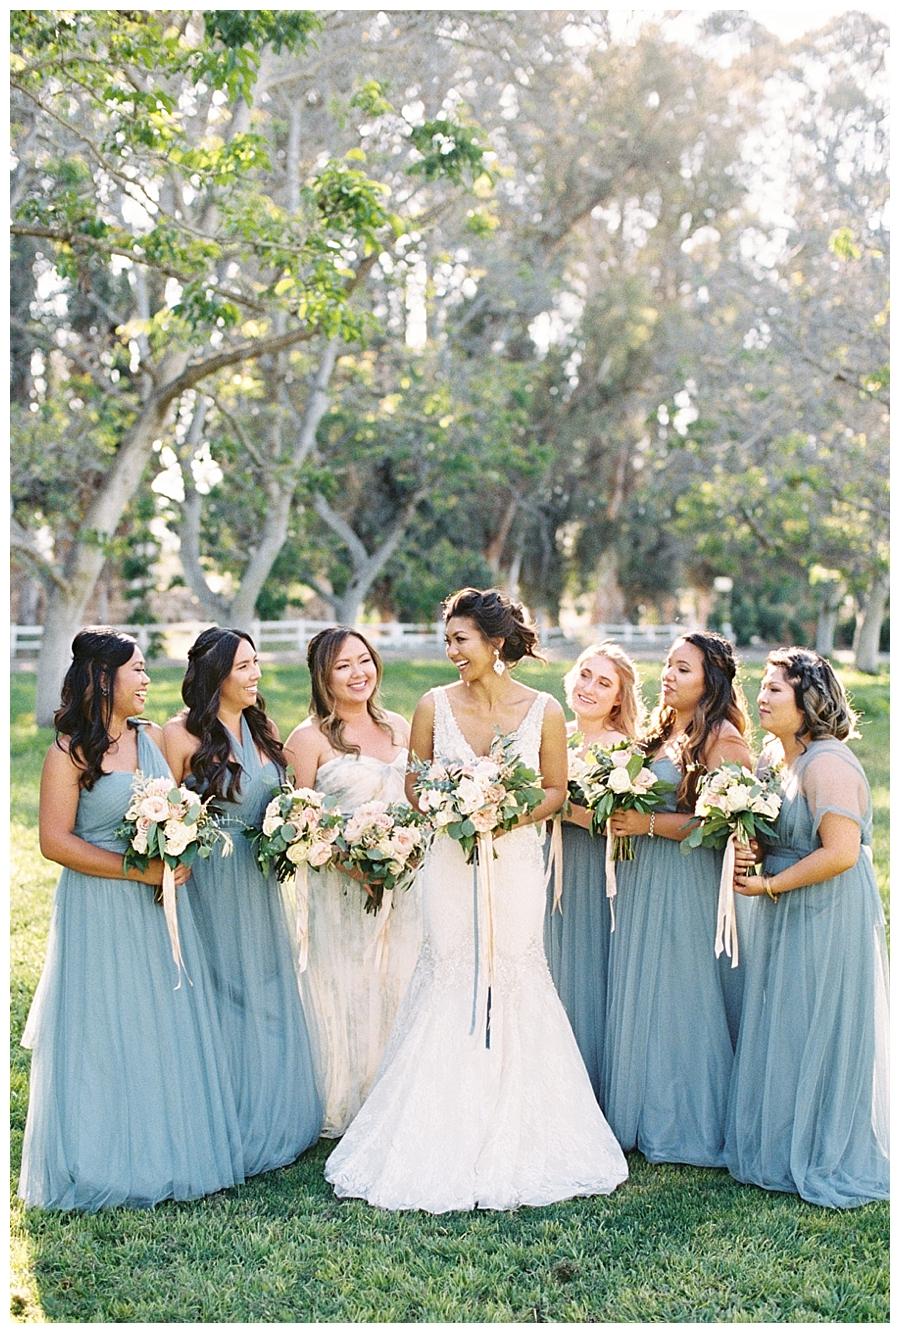 destination fine art wedding photography at Walnut Grove Weddings in Moorpark California